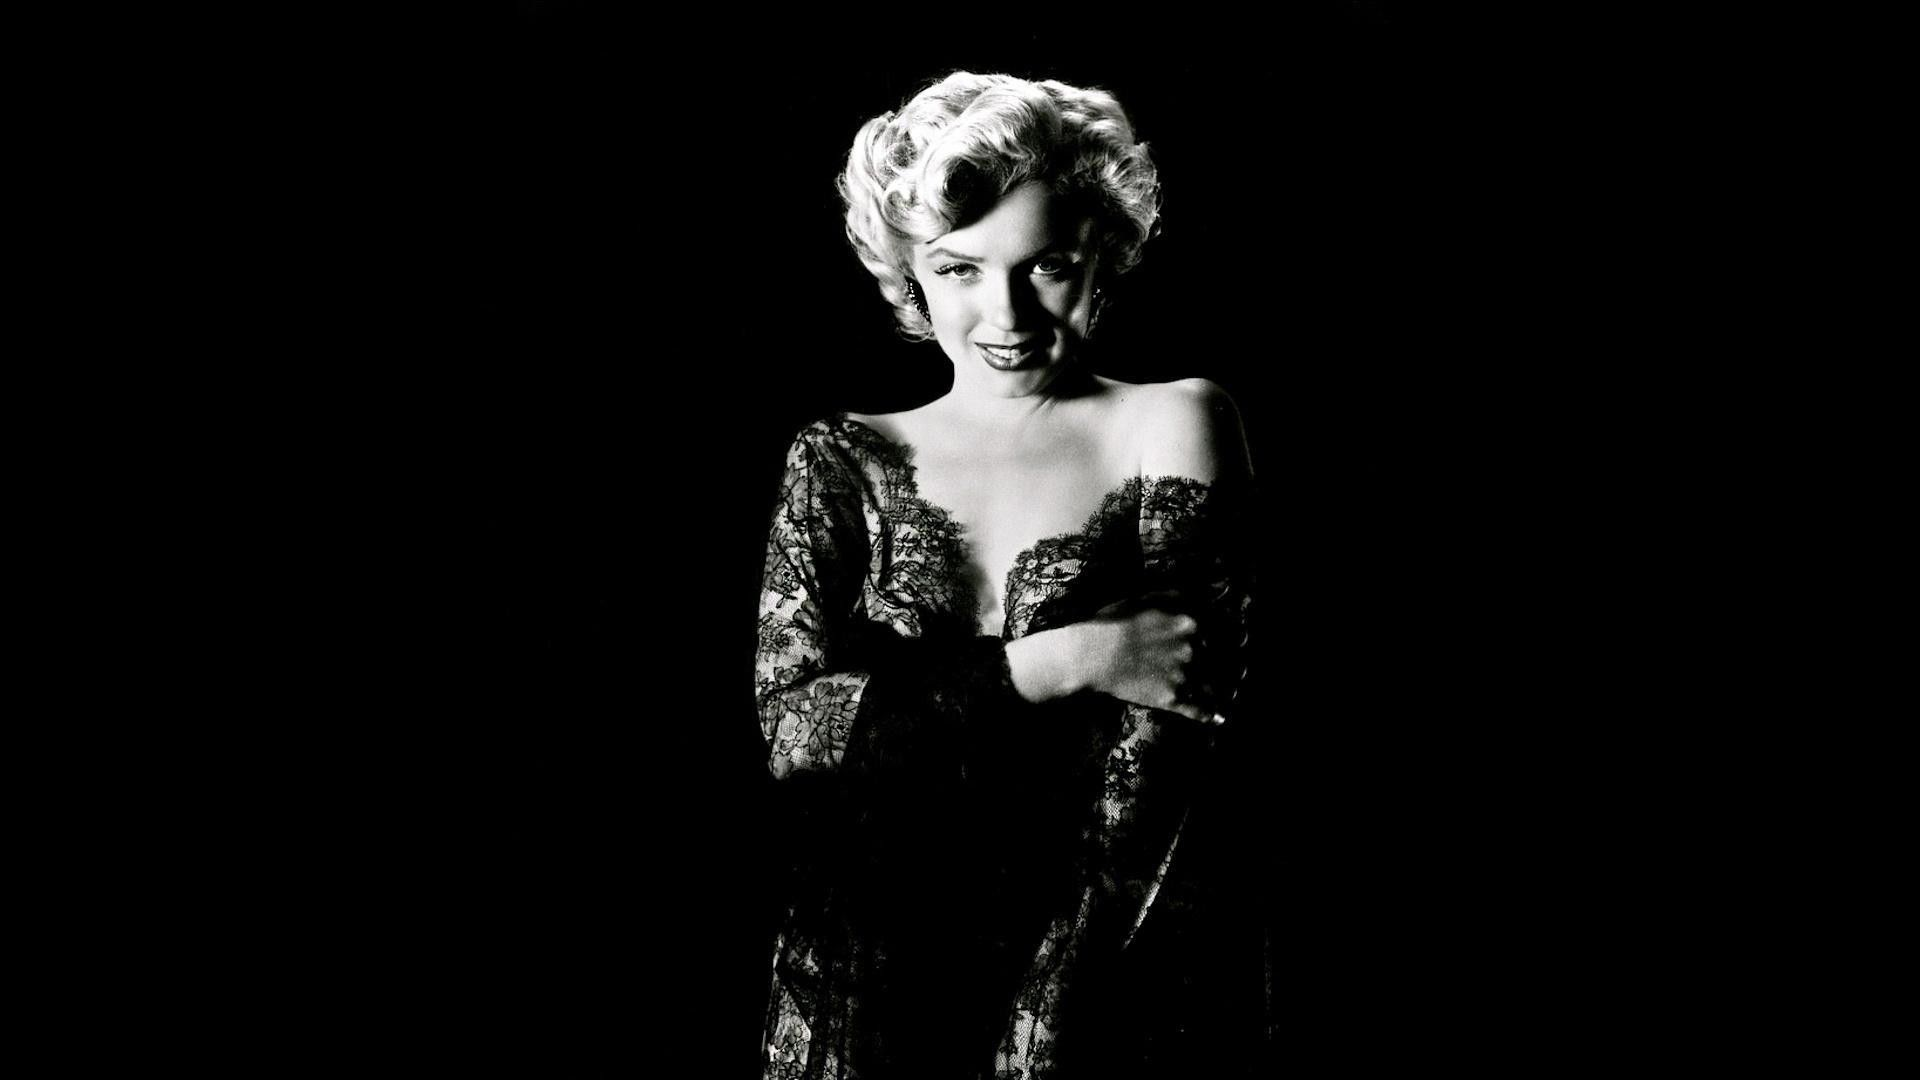 Fond Ecran Celebrite Marilyn Monroe Noir Et Blanc Wallpaper Hd Black And White Celebrity Fond D Ecran Marilyn Monroe Noir Et Blanc Ecran Noir Et Blanc